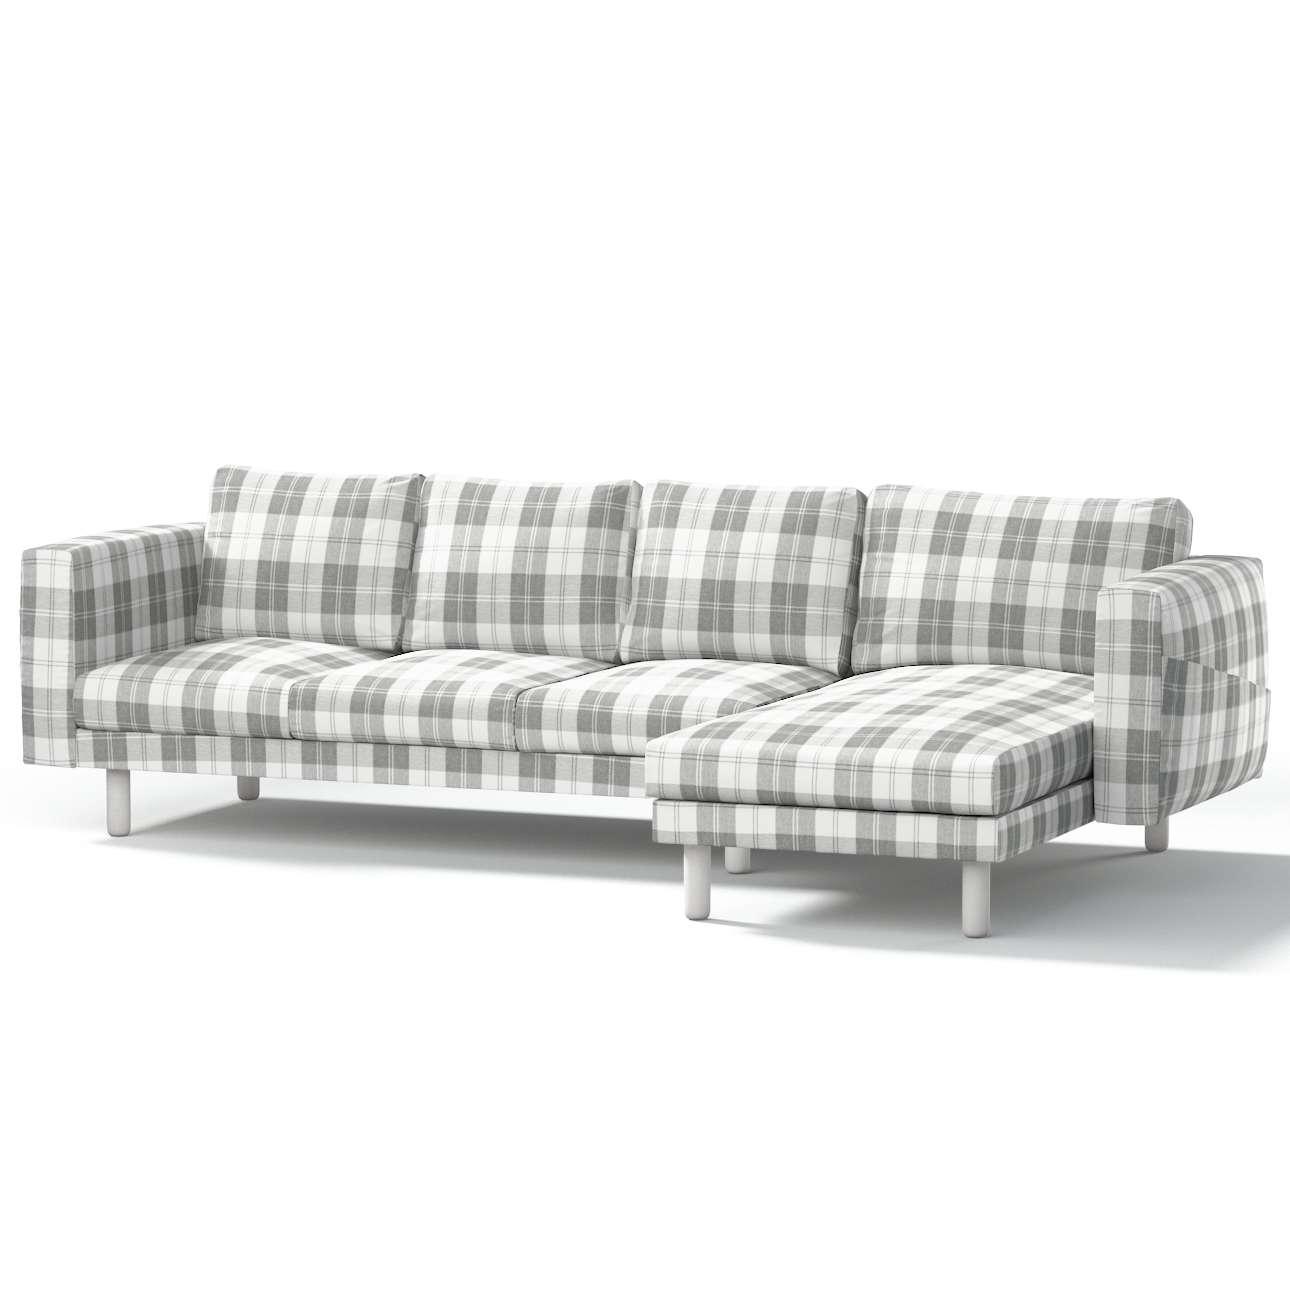 norsborg bezug f r 4 sitzer sofa mit recamiere wei grau. Black Bedroom Furniture Sets. Home Design Ideas